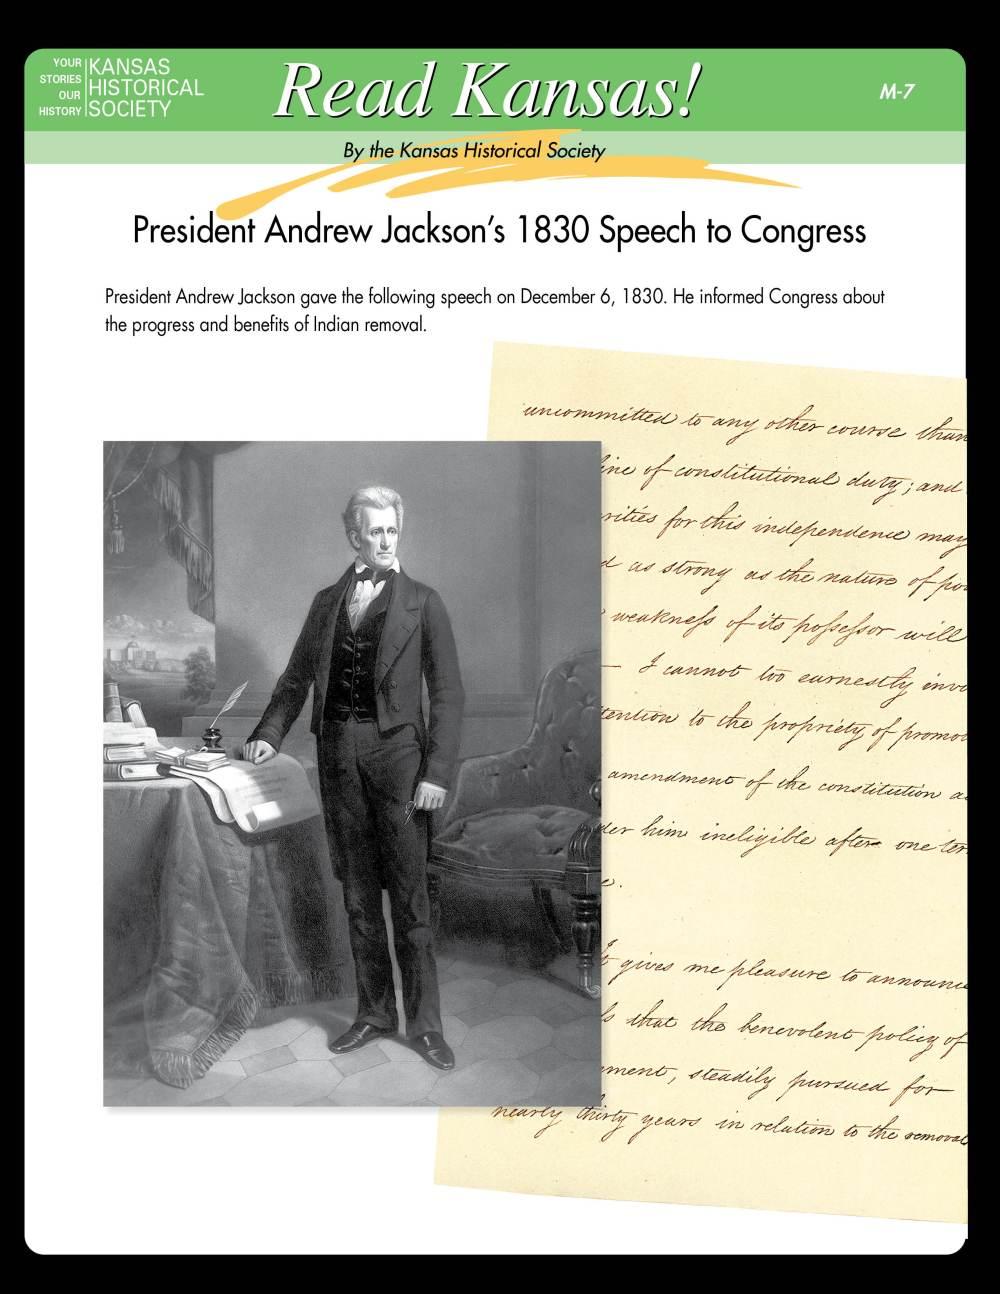 medium resolution of Read Kansas! Middle School Lessons - Kansas Historical Society